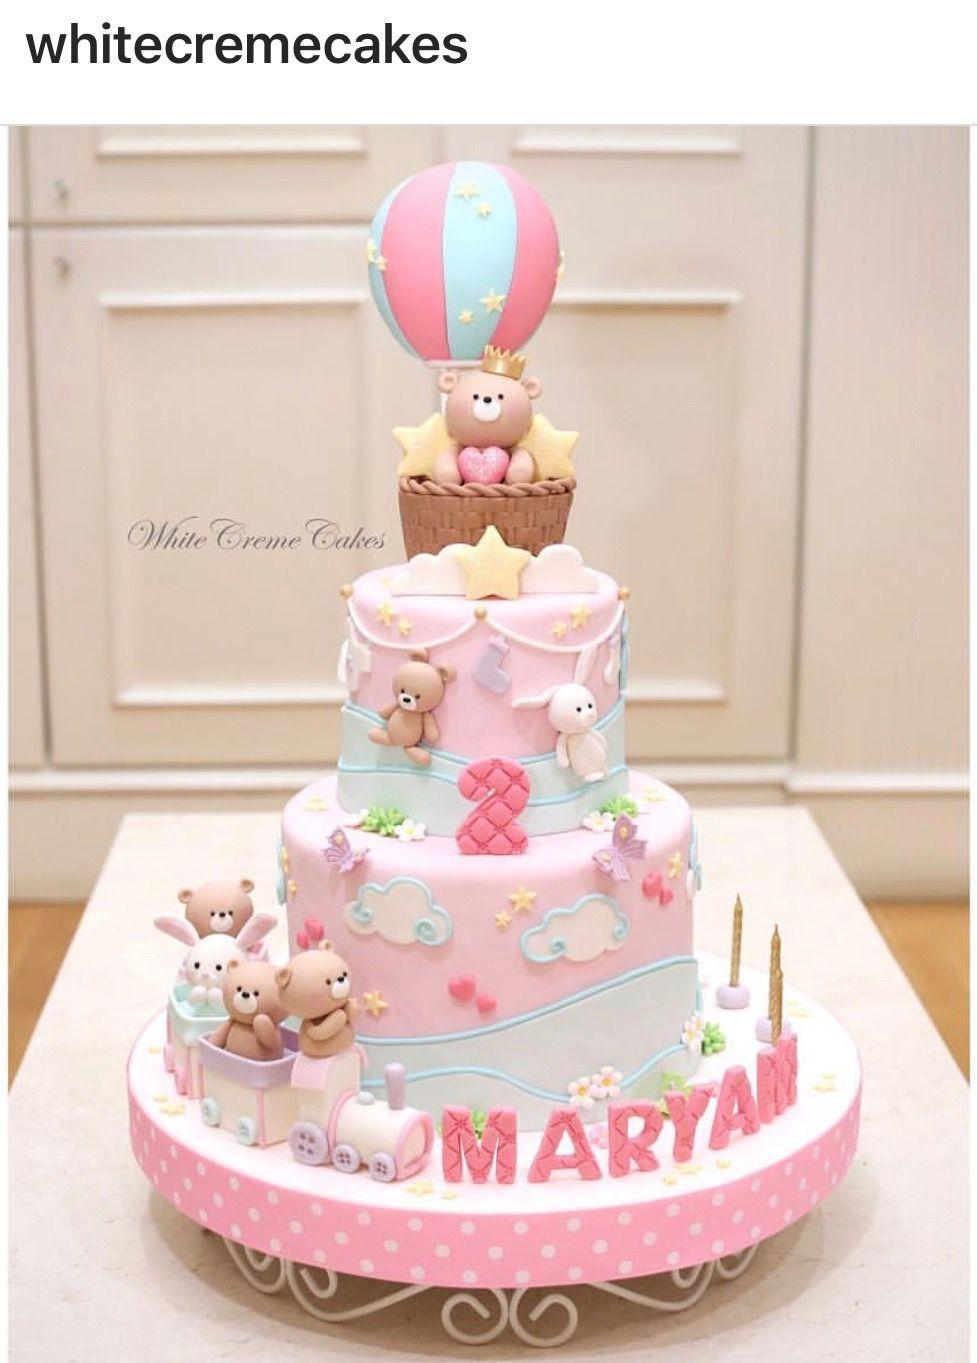 Kawaii, pink, cartoon cake, girly, birthday cake 1st